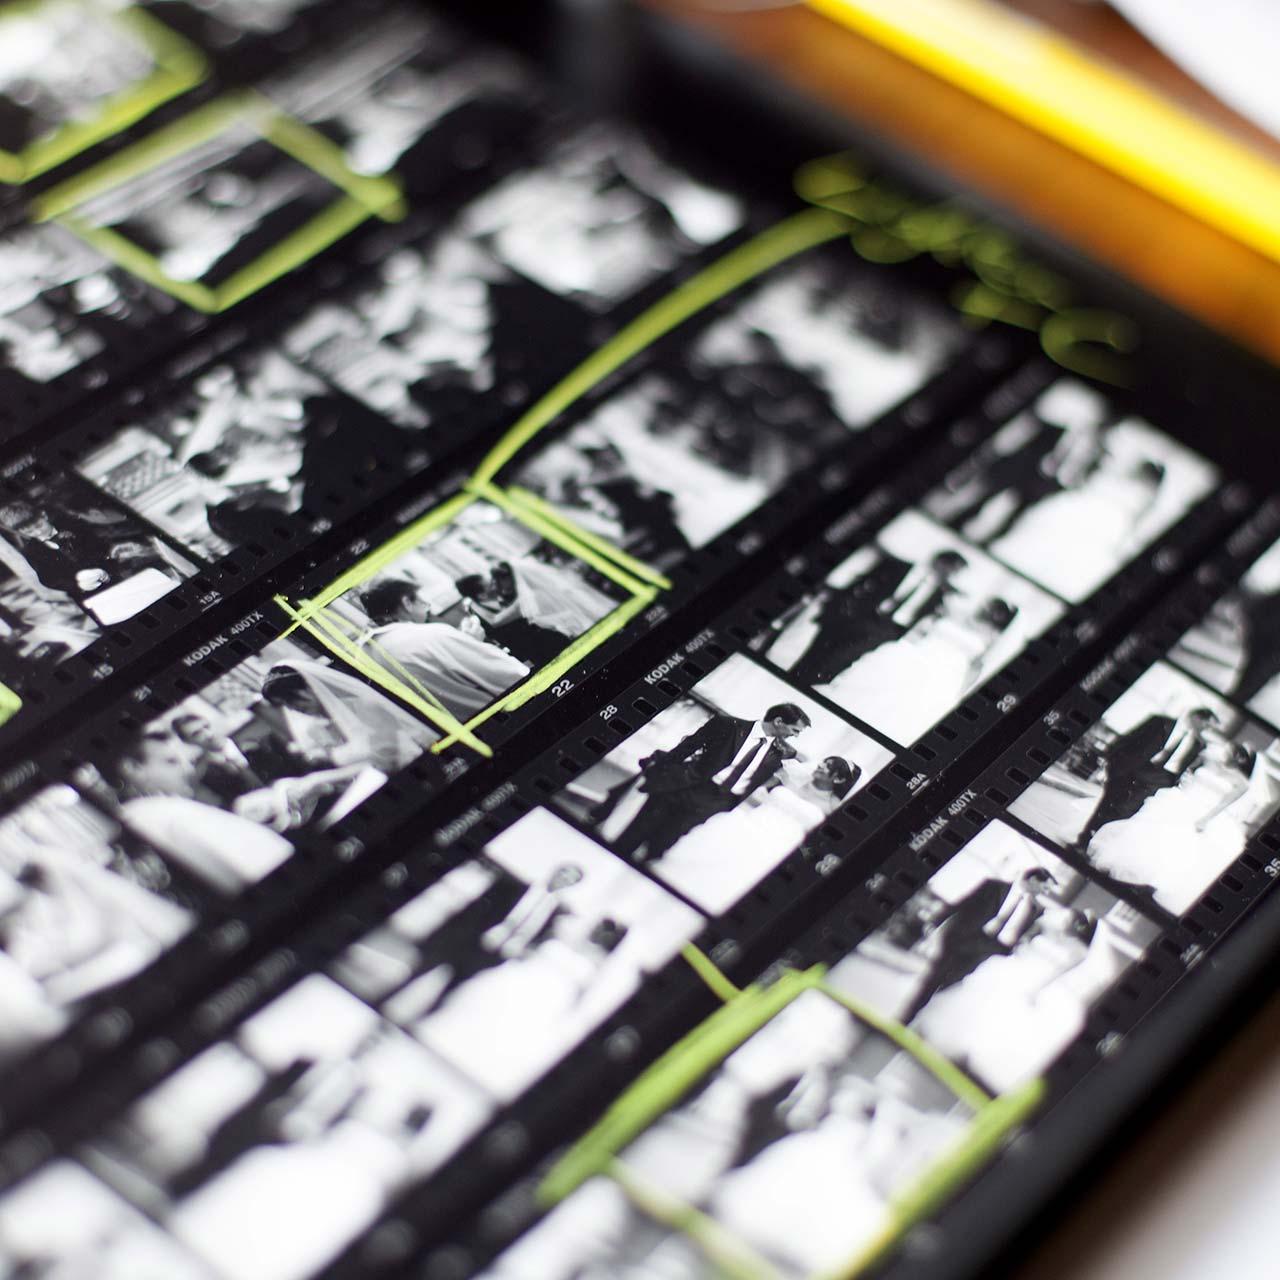 Richard Payne Memory Archive Box